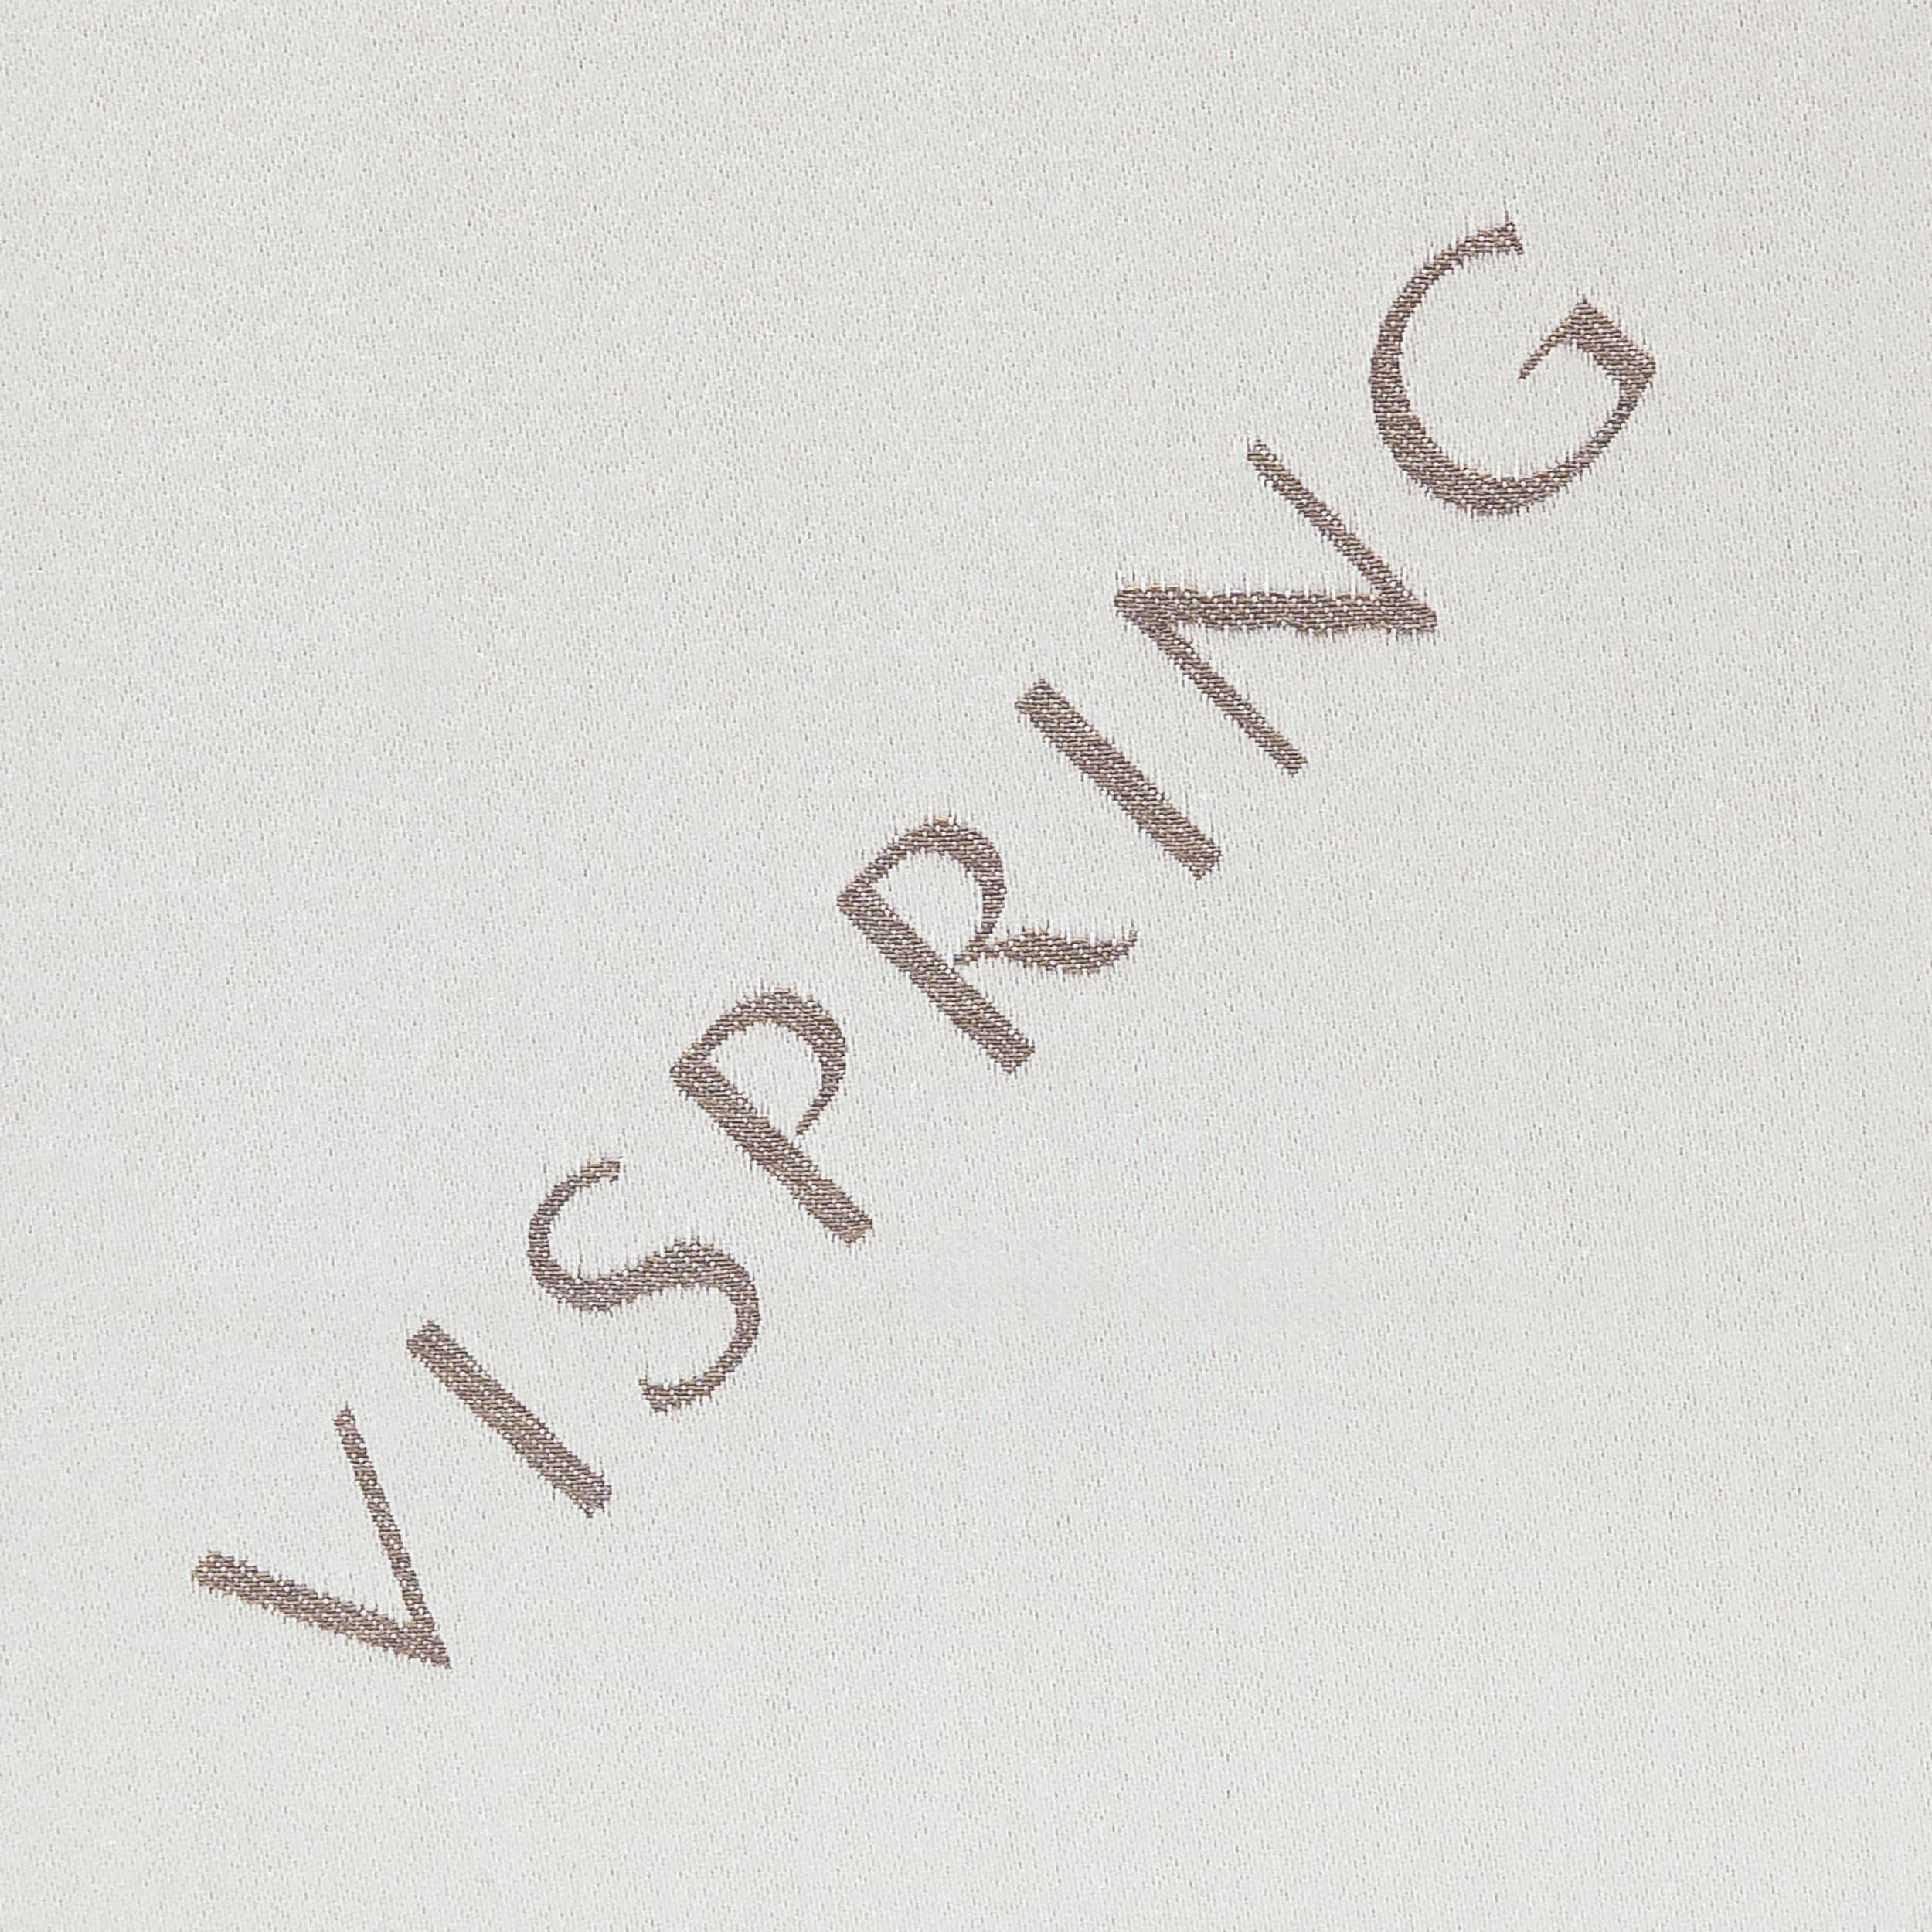 VISPRING LOGO - Pale Silver